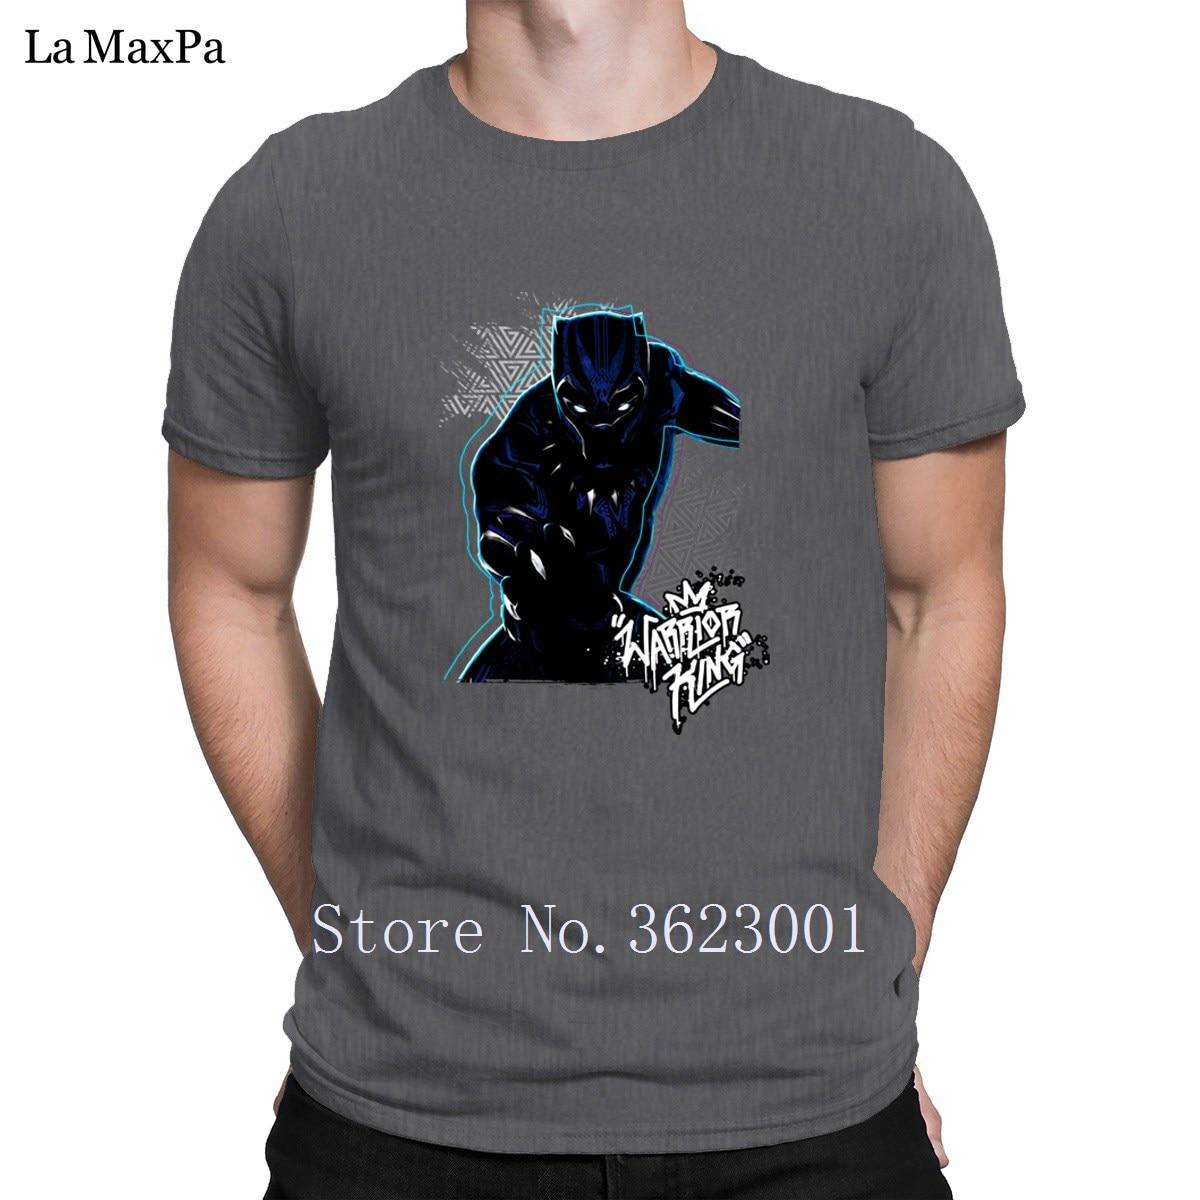 Knitted Cool T-Shirt For Men Geometric Warrior King Tee Shirt Man Original Tshirt Natural Men T Shirt Size S-3xl Fitness